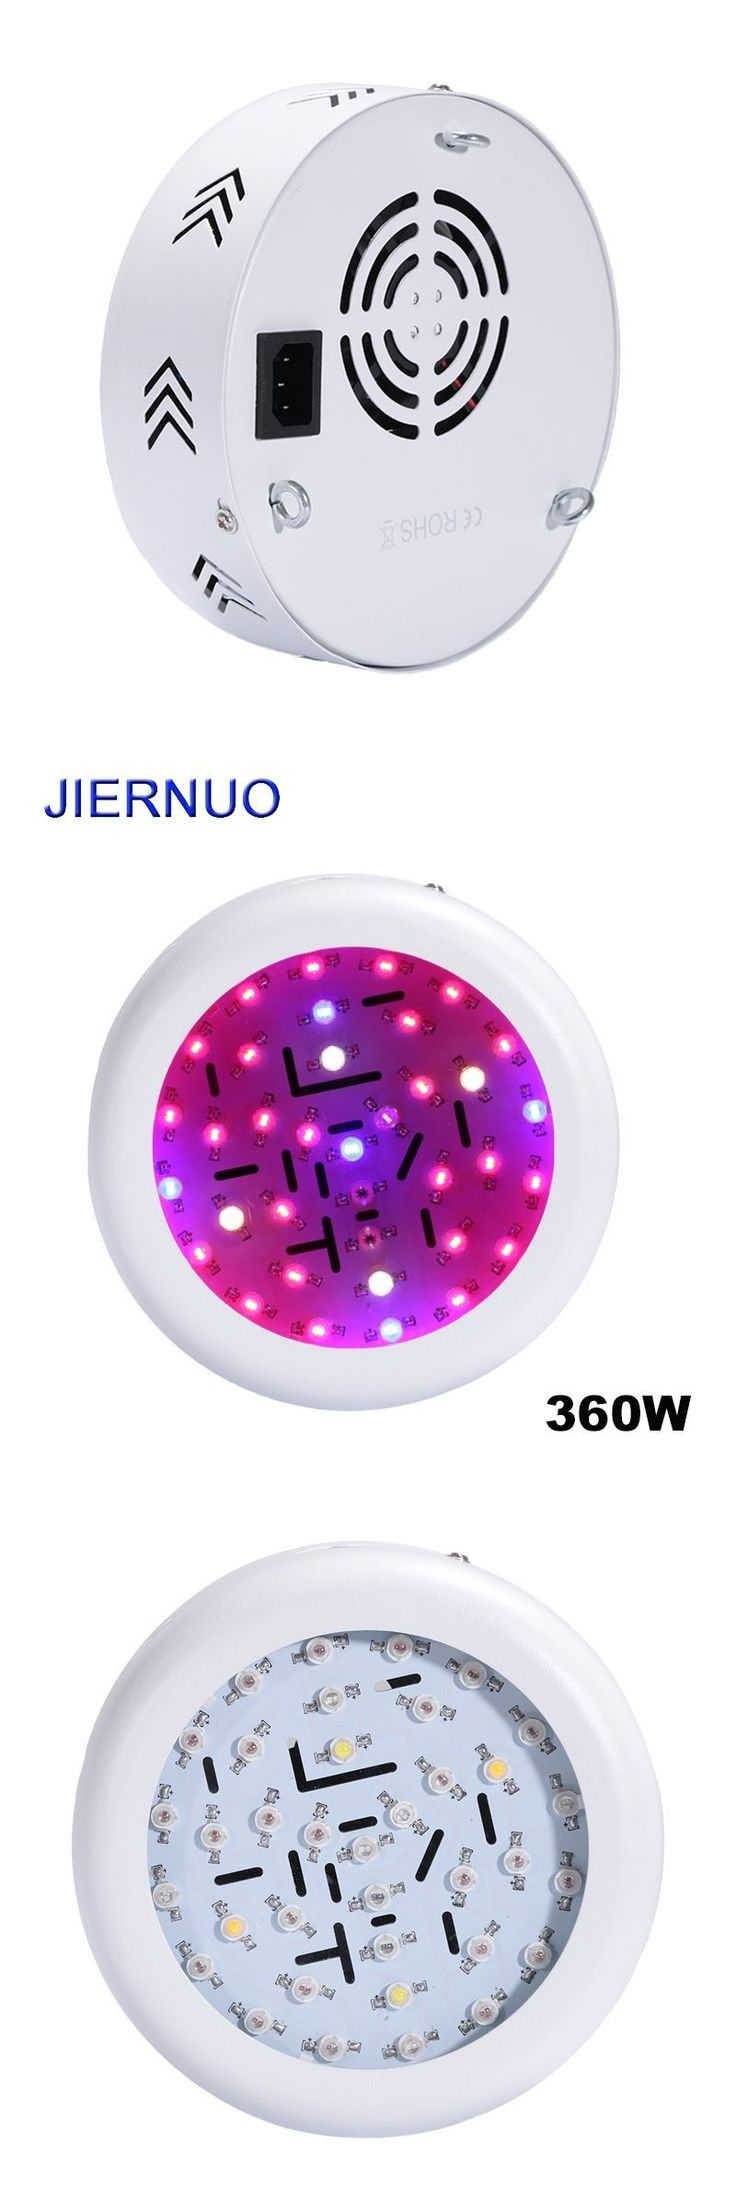 360W LED Plant Light UFO 10W Double Chips AC85~265V Red+Blue+warm white+white+IR+UV LED Grow Lights Hydroponics Flowers grow AE #hydroponicsflowers